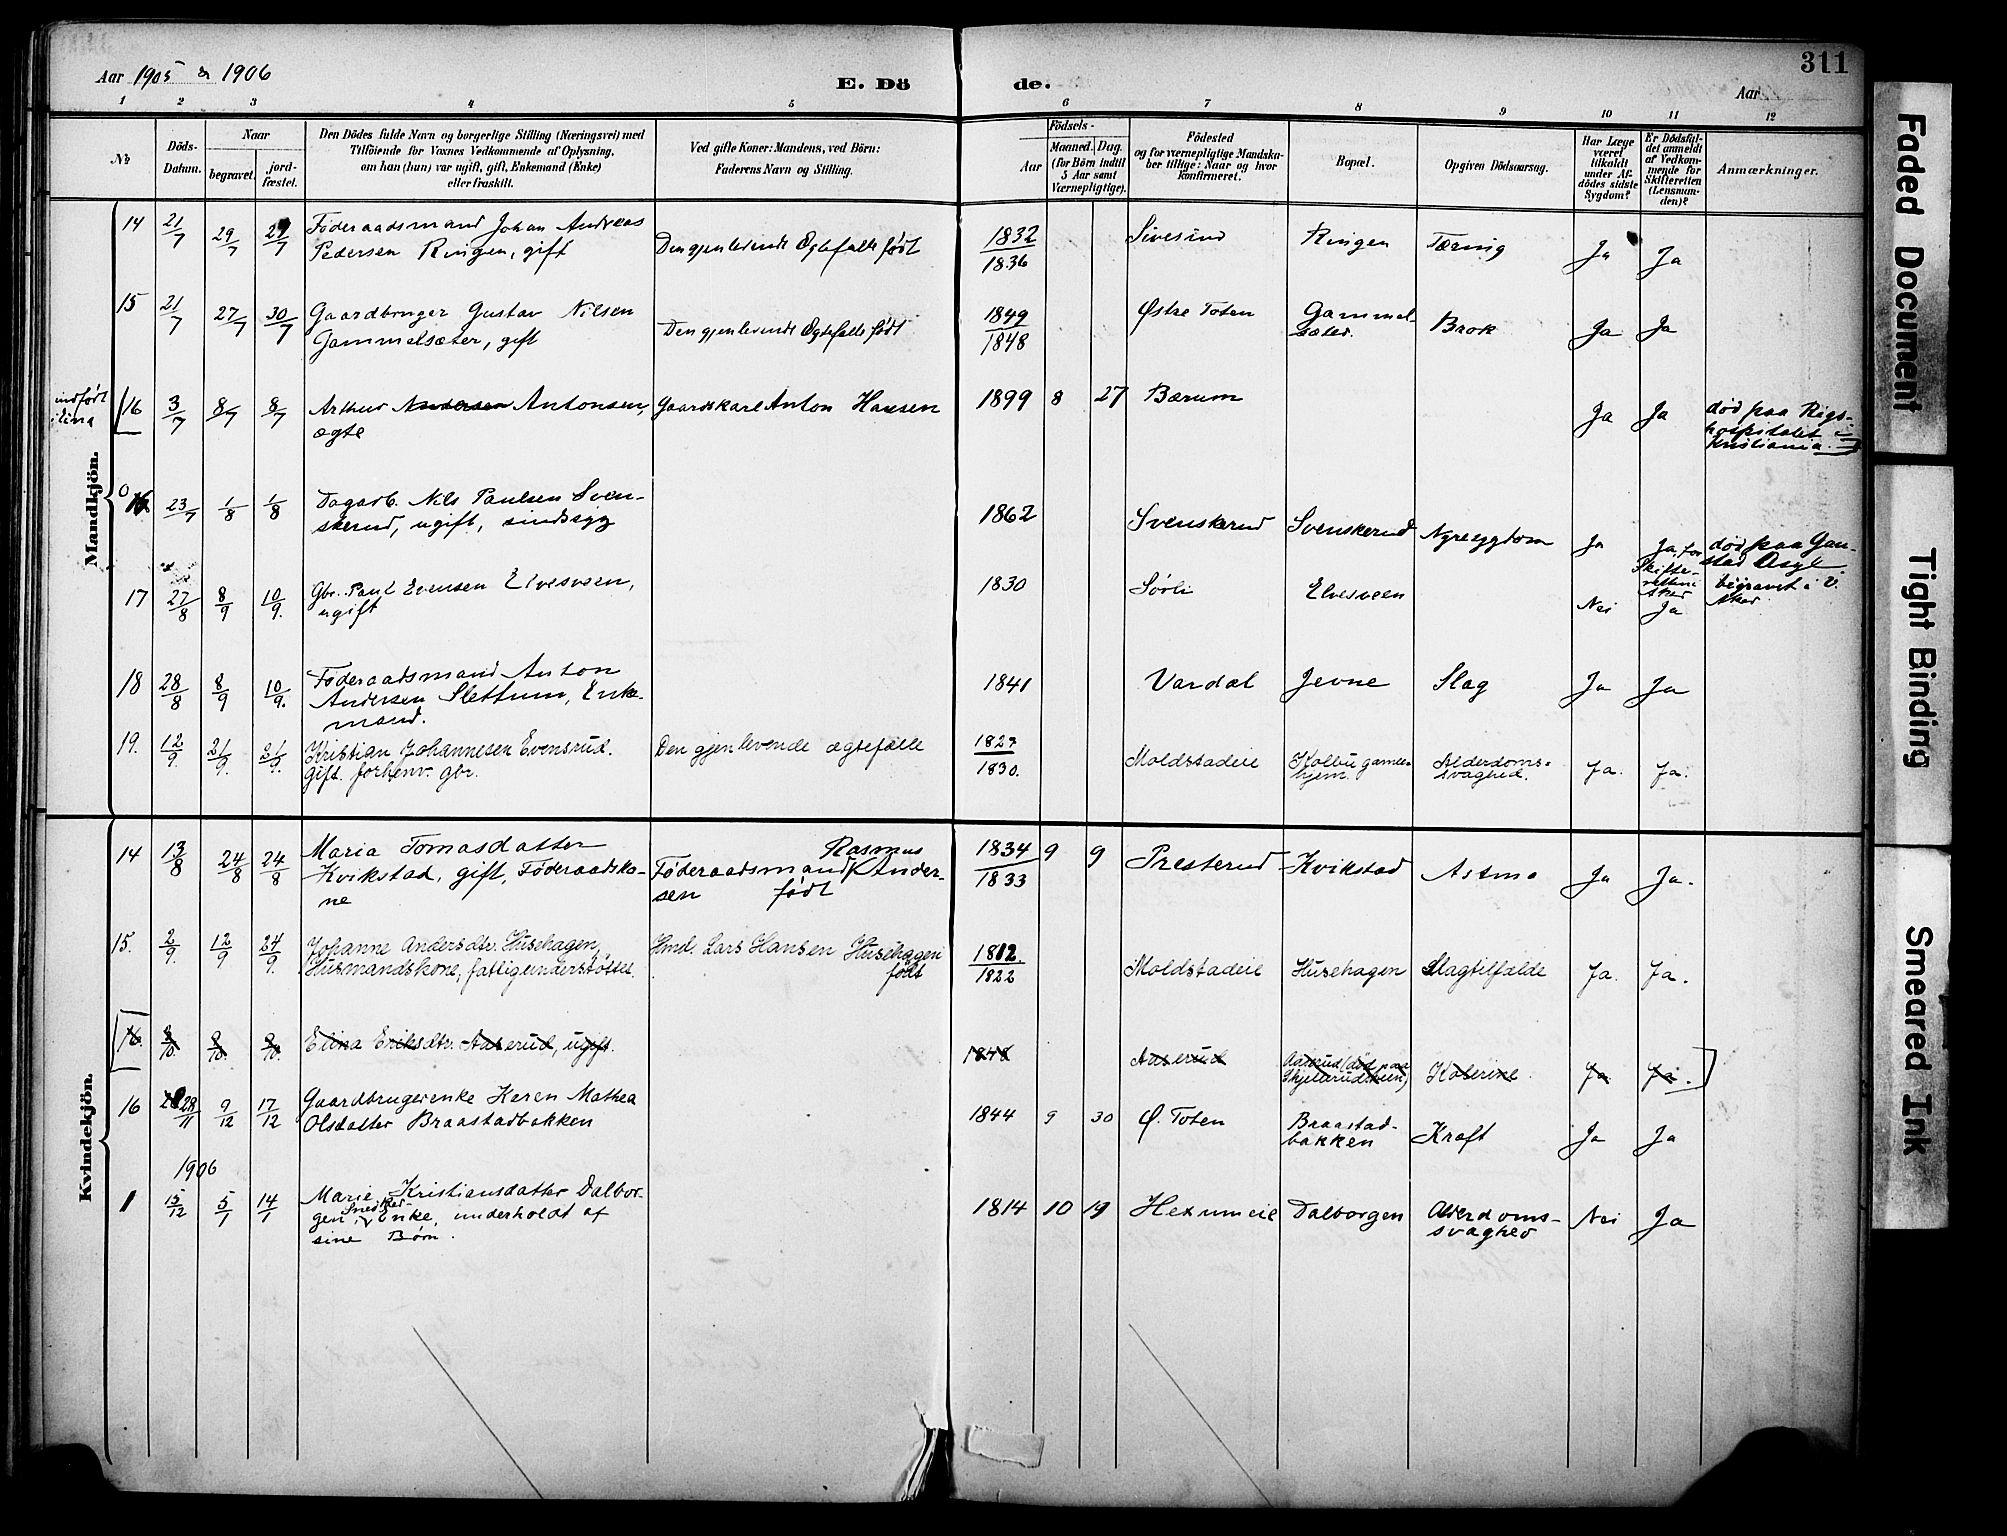 SAH, Vestre Toten prestekontor, H/Ha/Haa/L0013: Ministerialbok nr. 13, 1895-1911, s. 311